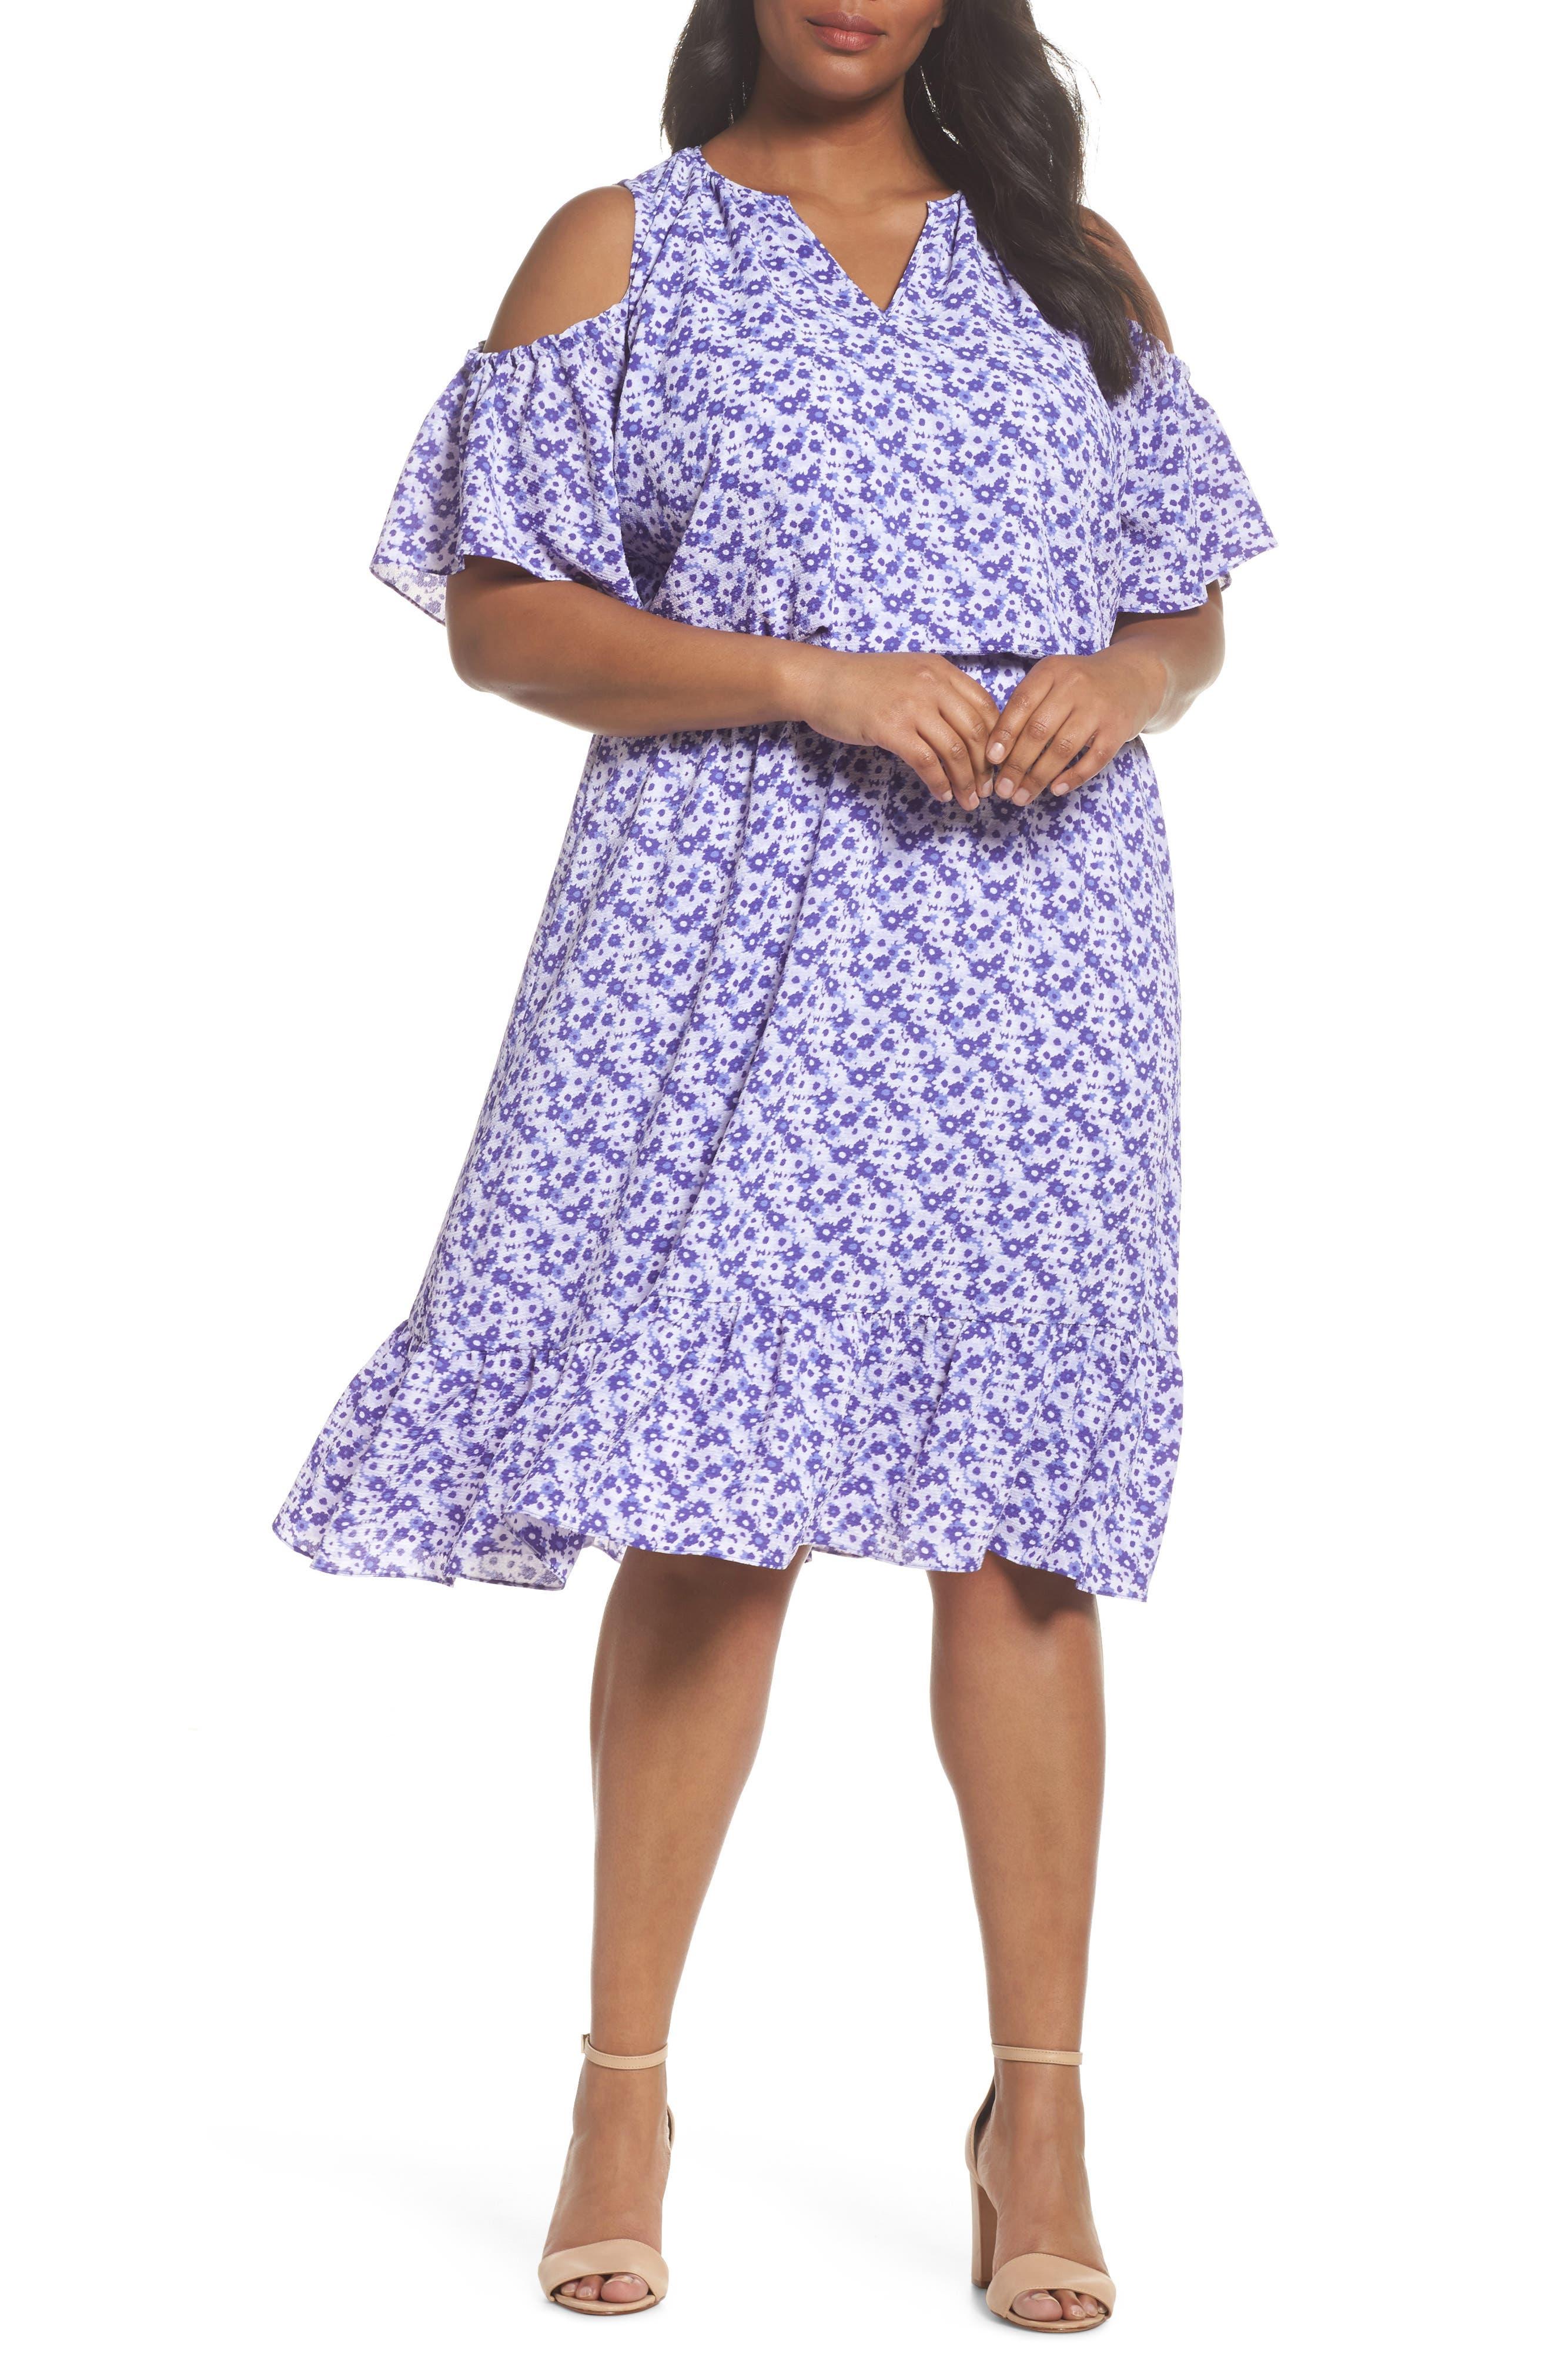 Floral Cold Shoulder Midi Dress,                         Main,                         color, Amethyst/ Light Quartz Multi